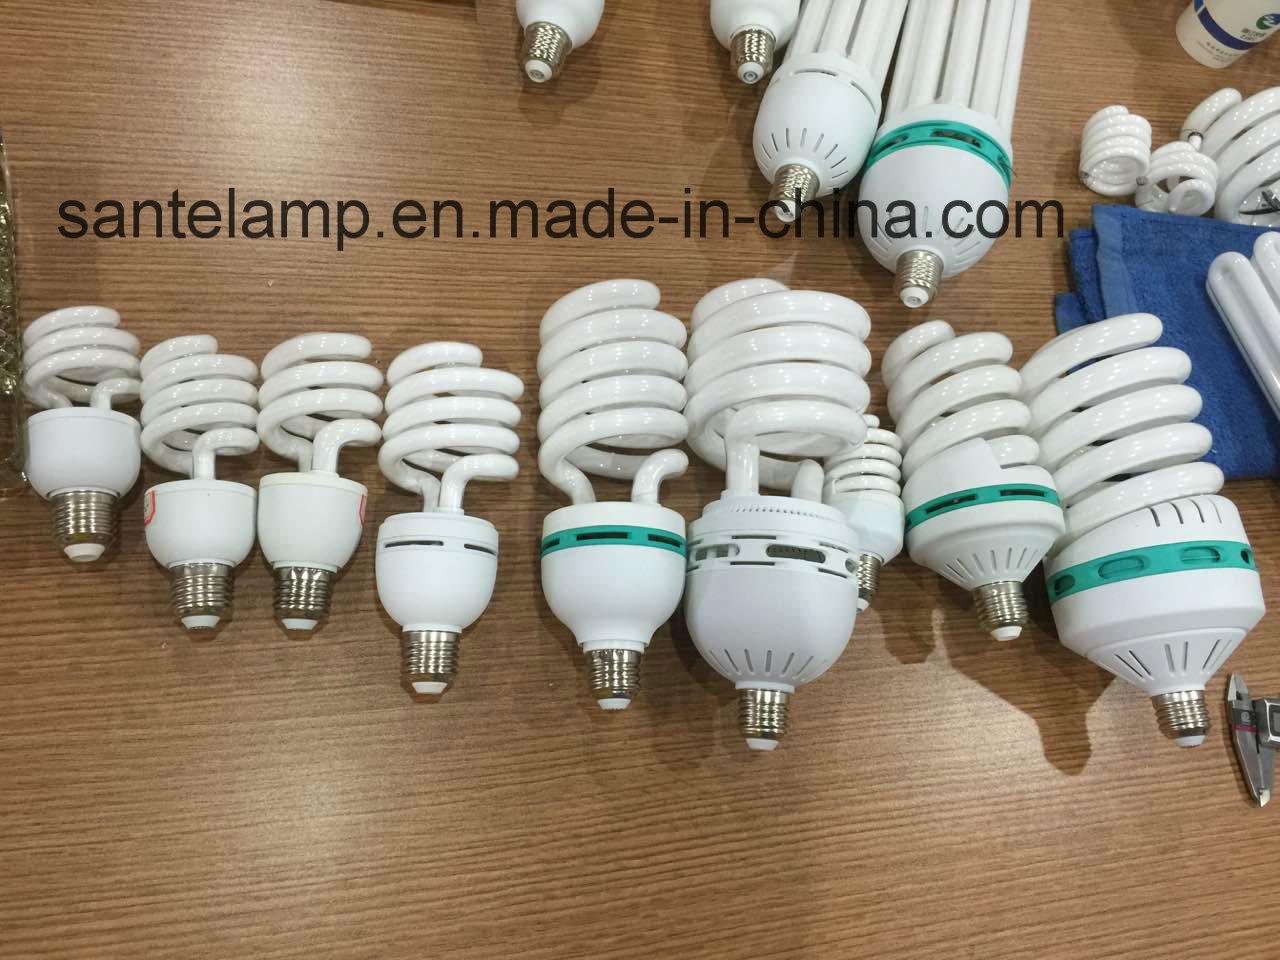 Energy Saving Lamp 24W 40W Half Spiral Halogen/Mixed/Tri-Color 2700k-7500k E27/B22 220-240V